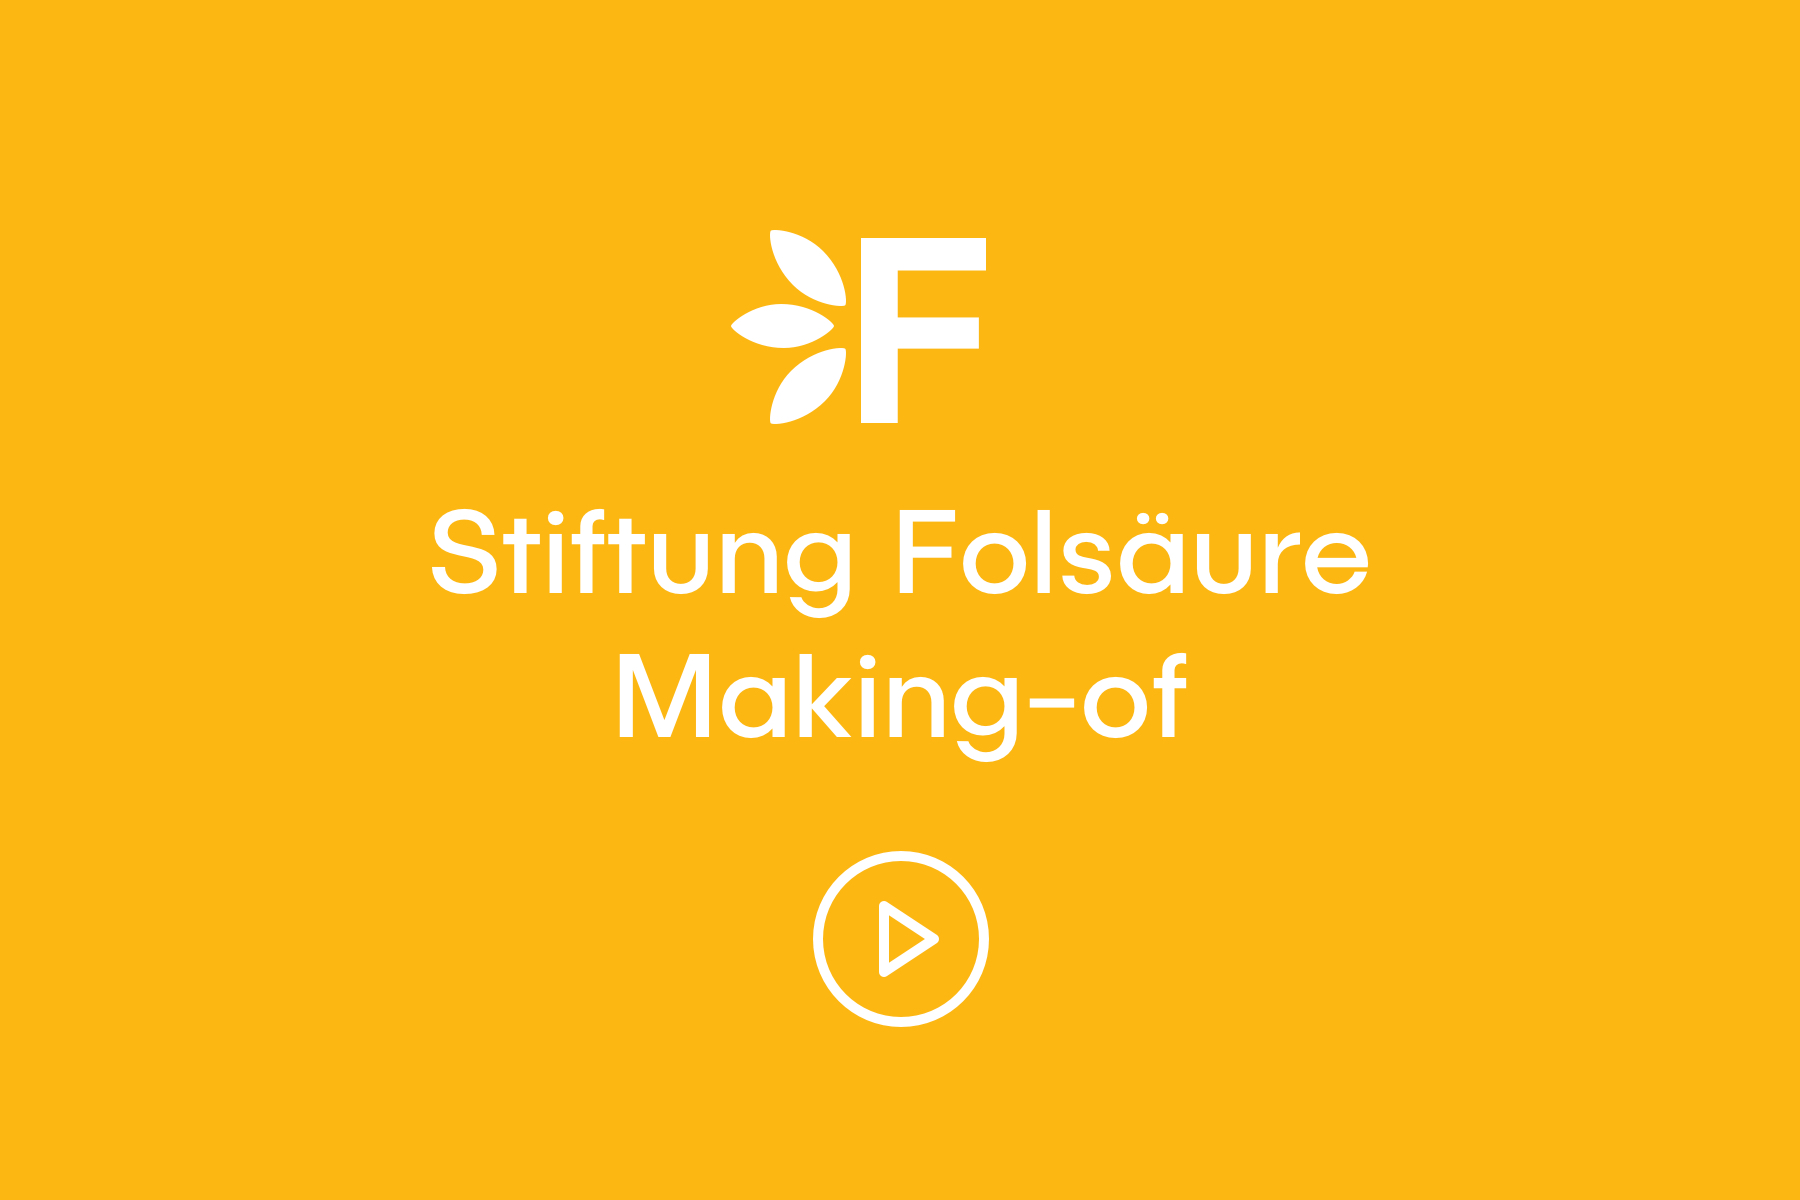 stiftungfolsaure_making-of